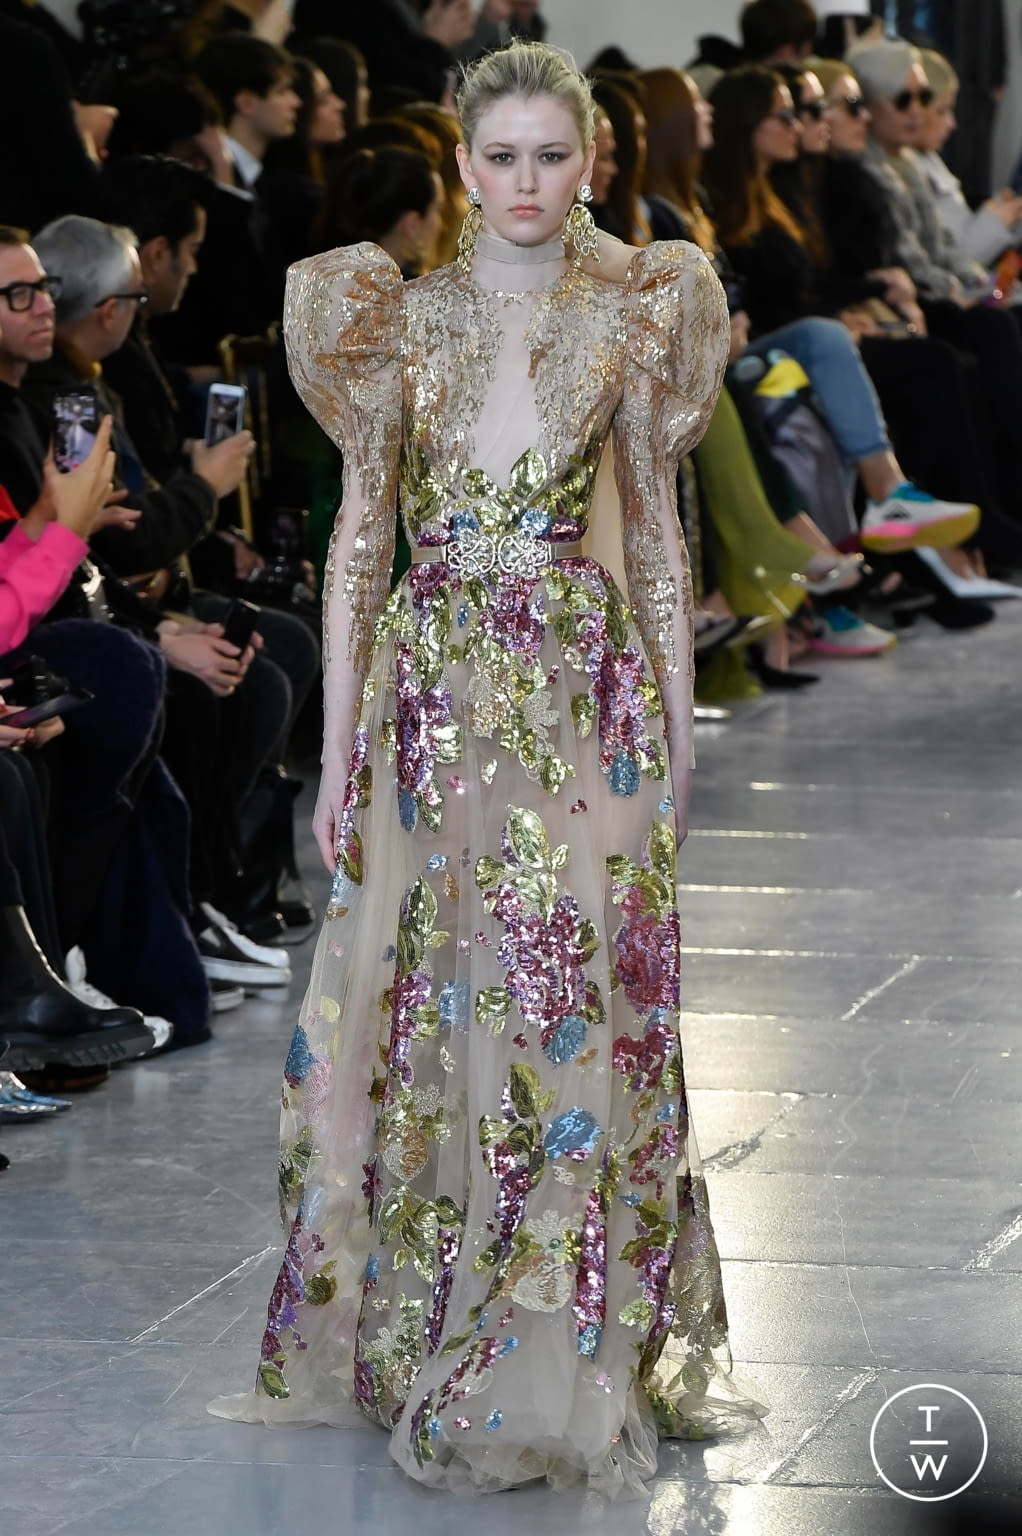 Elie Saab Ss20 Couture 43 The Fashion Search Engine Tagwalk